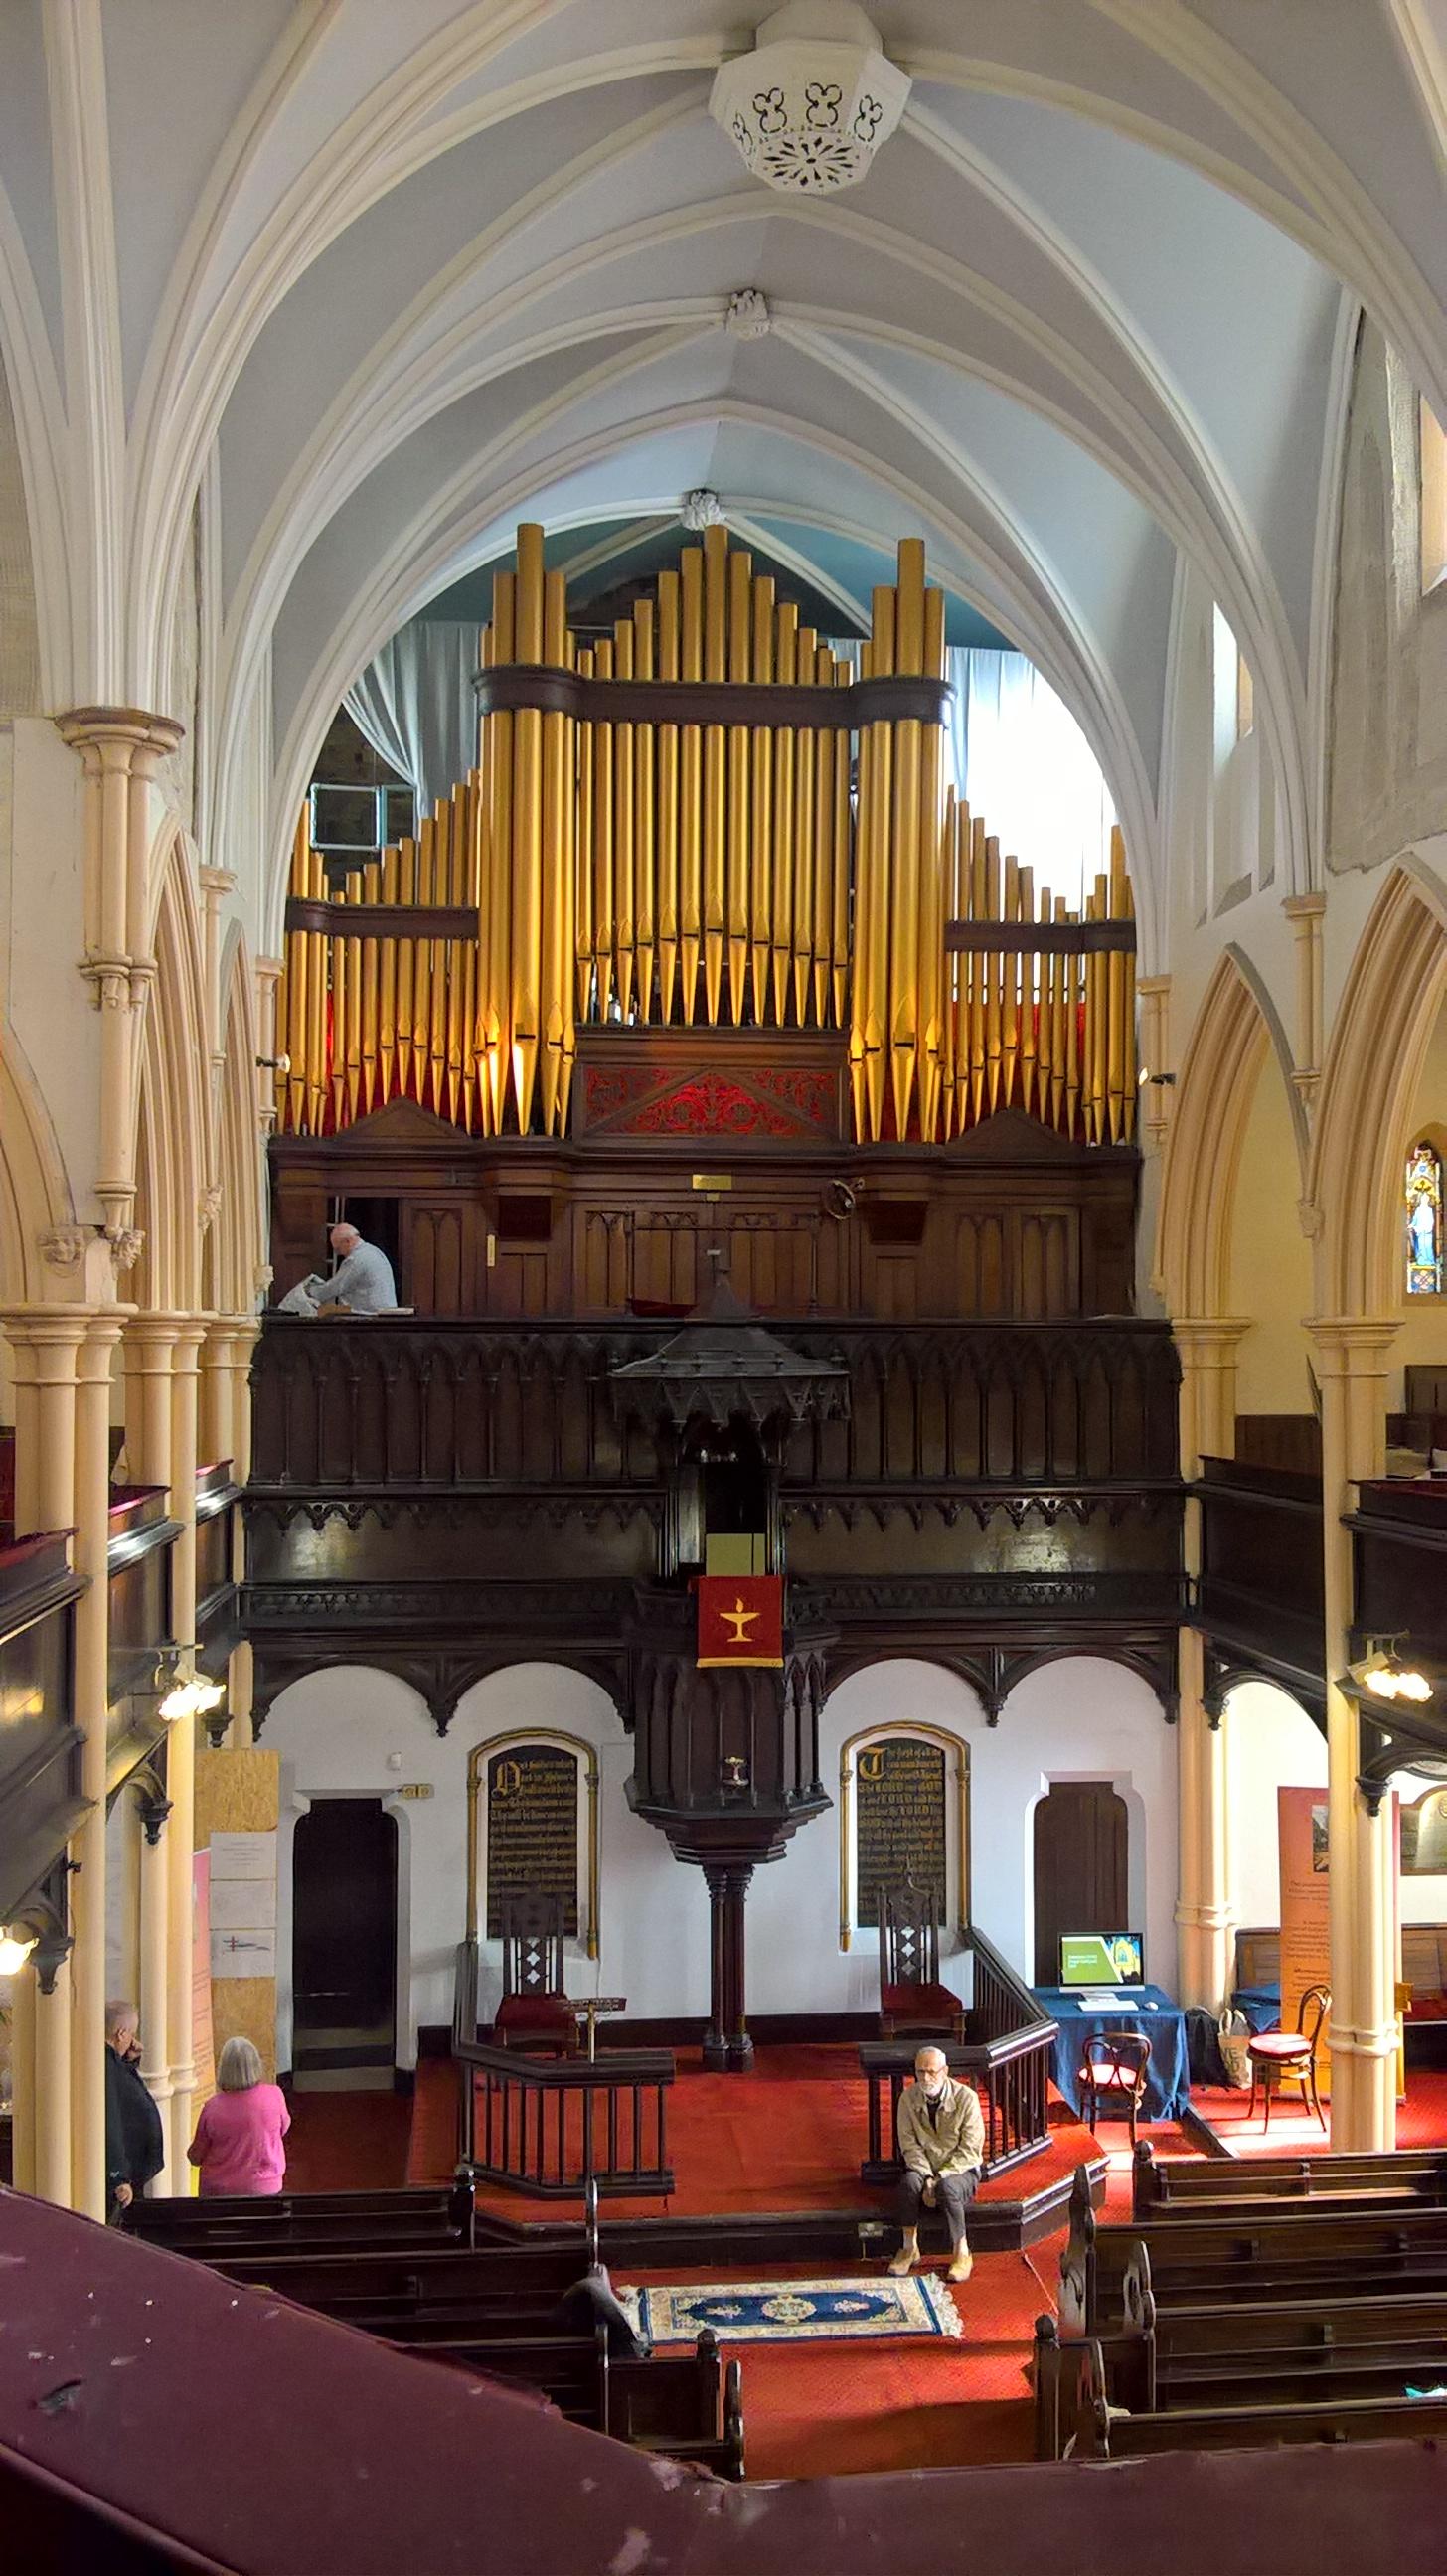 Dukinfield Old Chapel interior